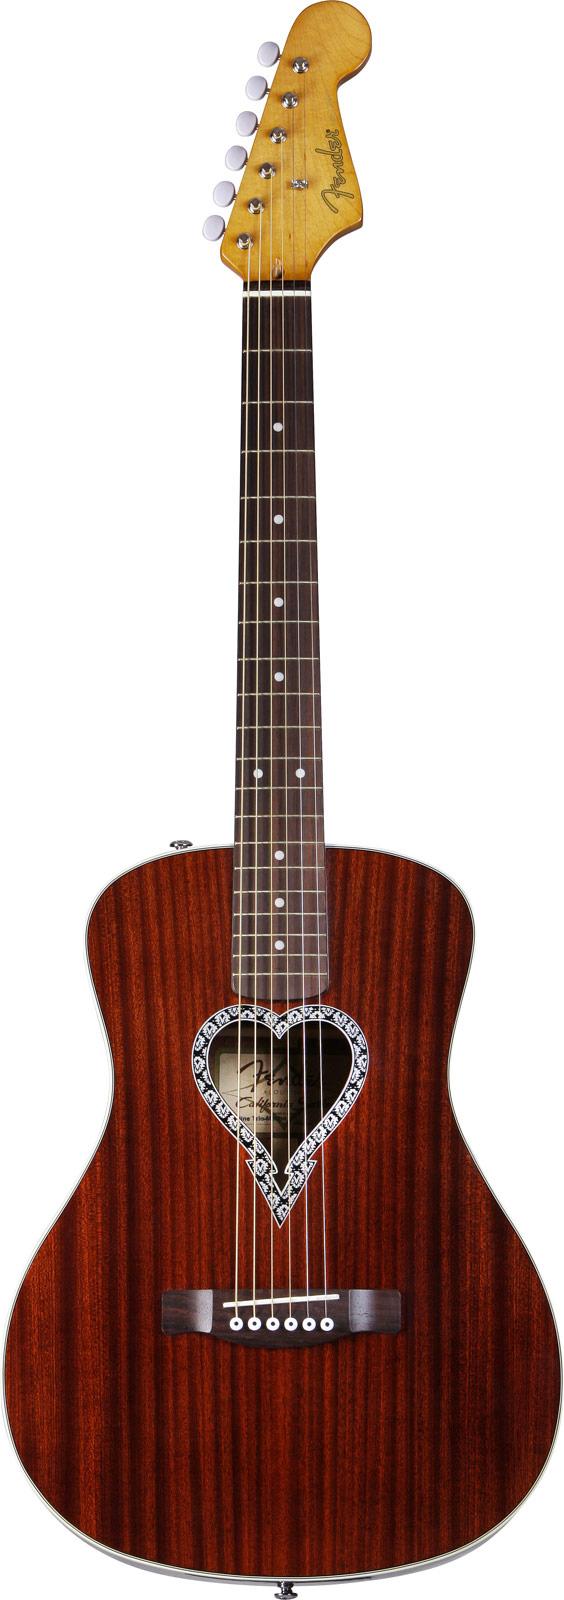 Fender Alkaline Trio Malibu Acajou